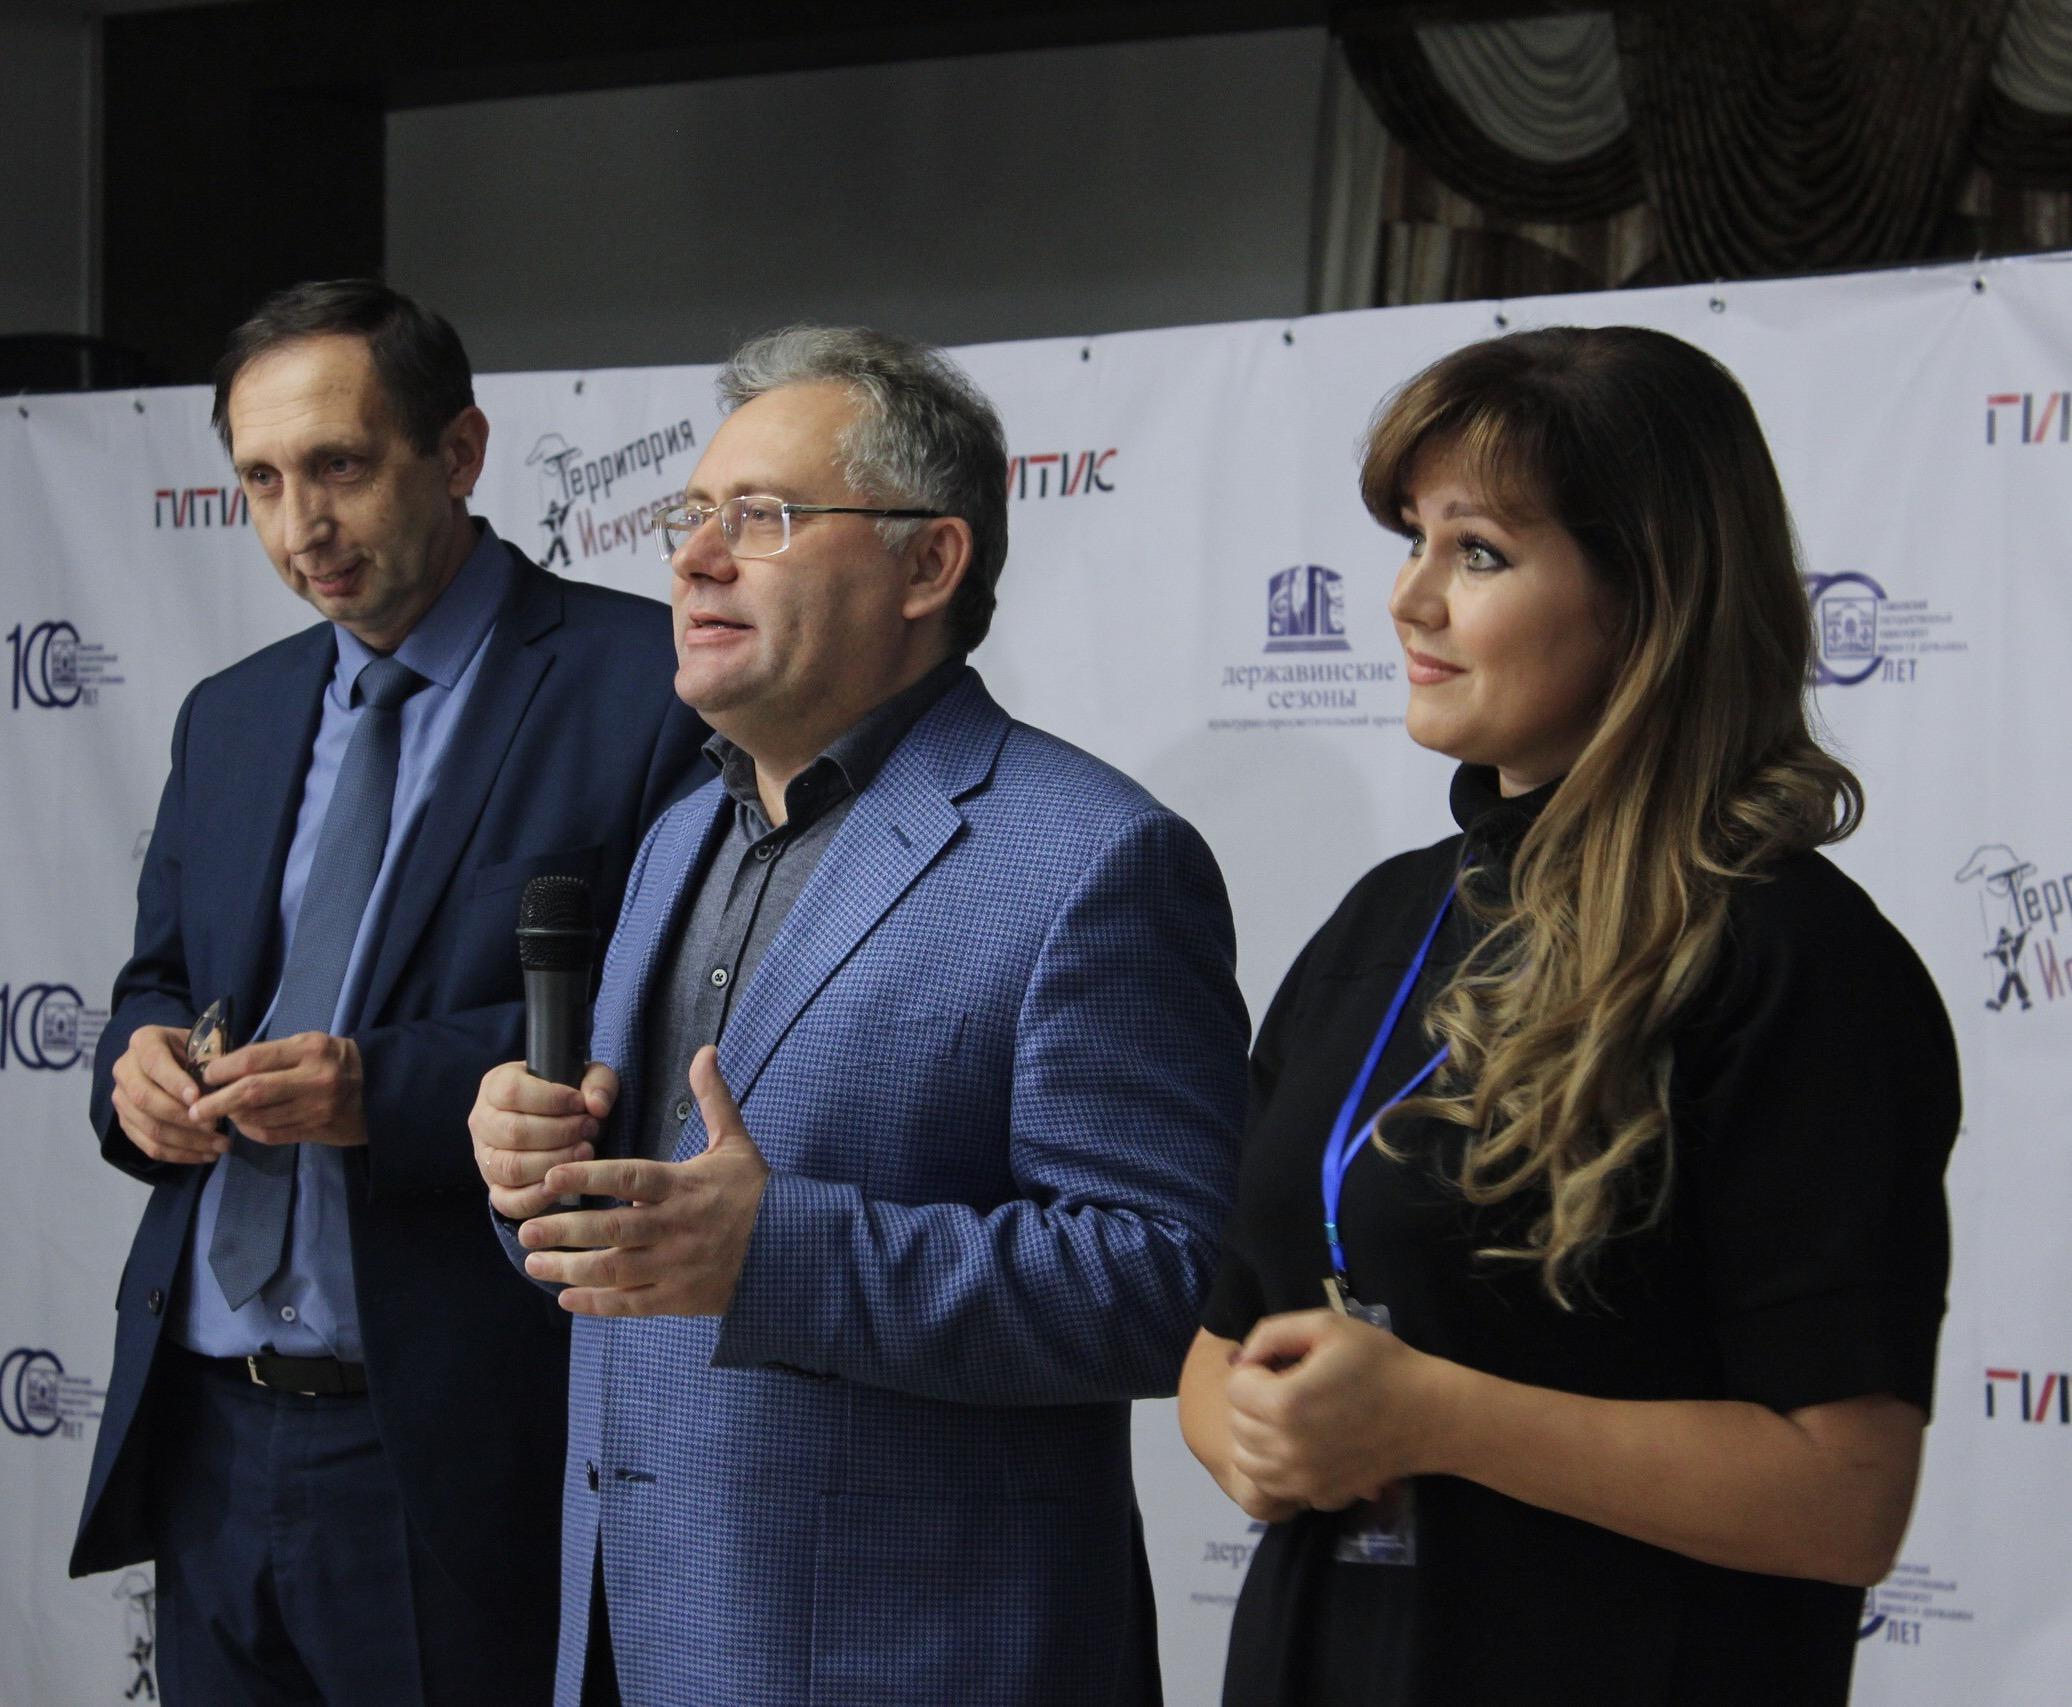 Тамбов посетили актеры ГИТИСа